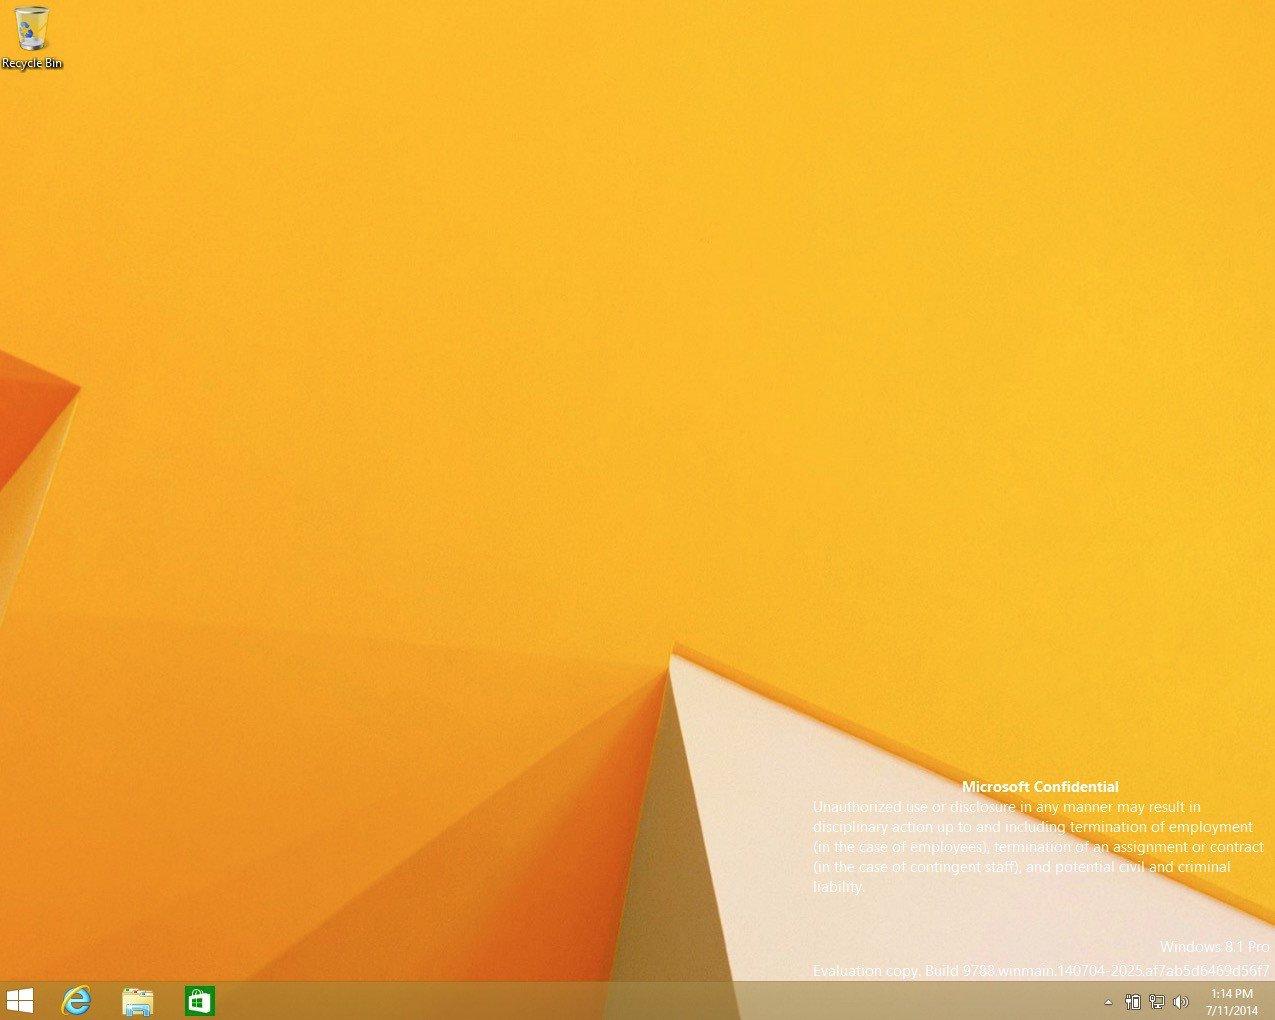 Windows 9 (Threshold) Build 9788 leaked